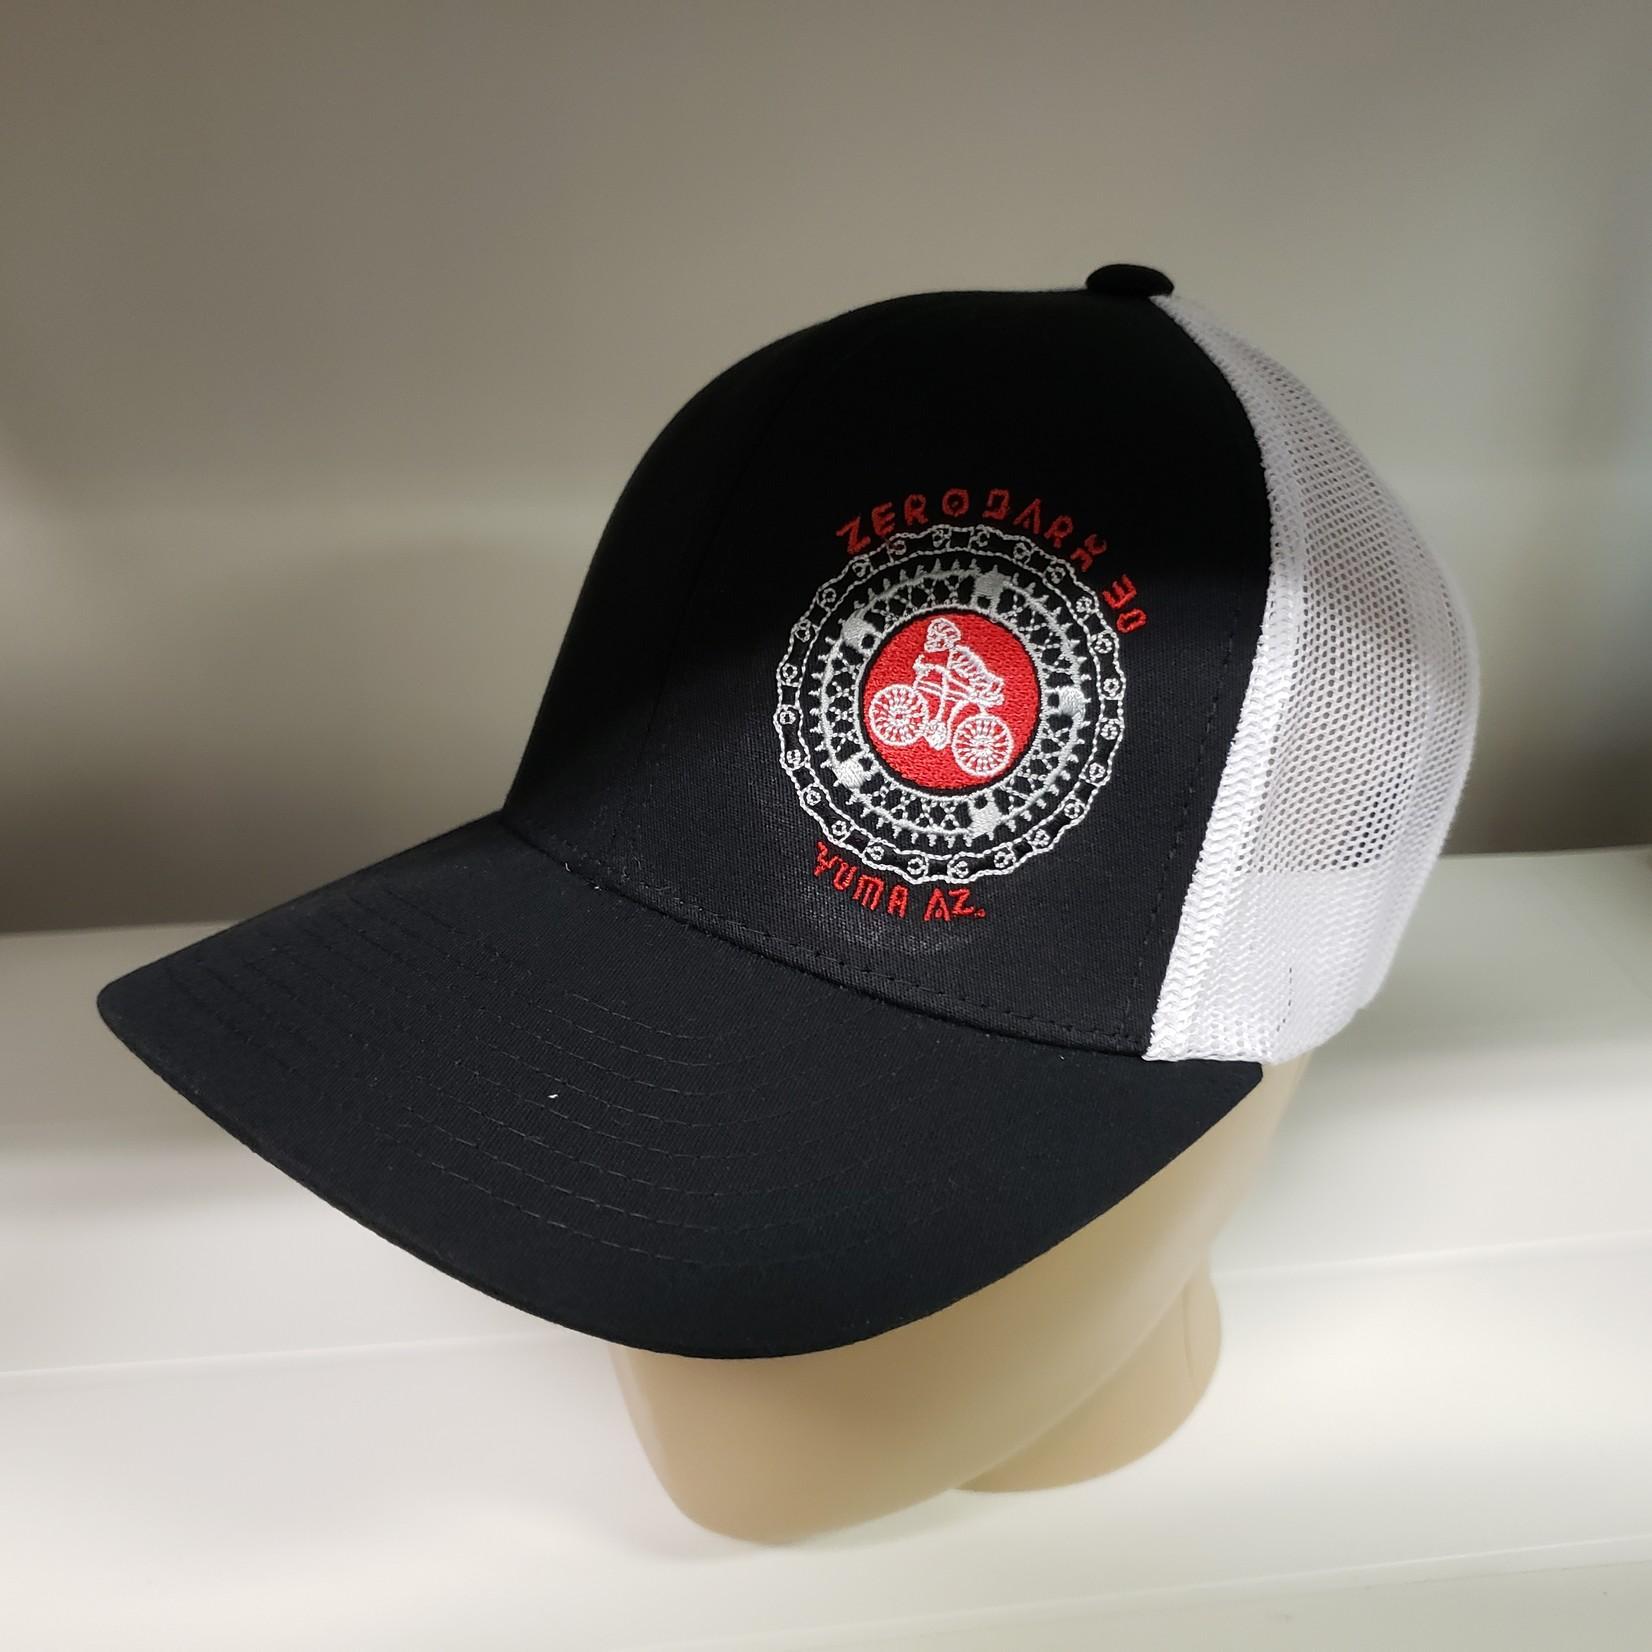 Richardson Hat - ZD30 - Blk/White - Snapback